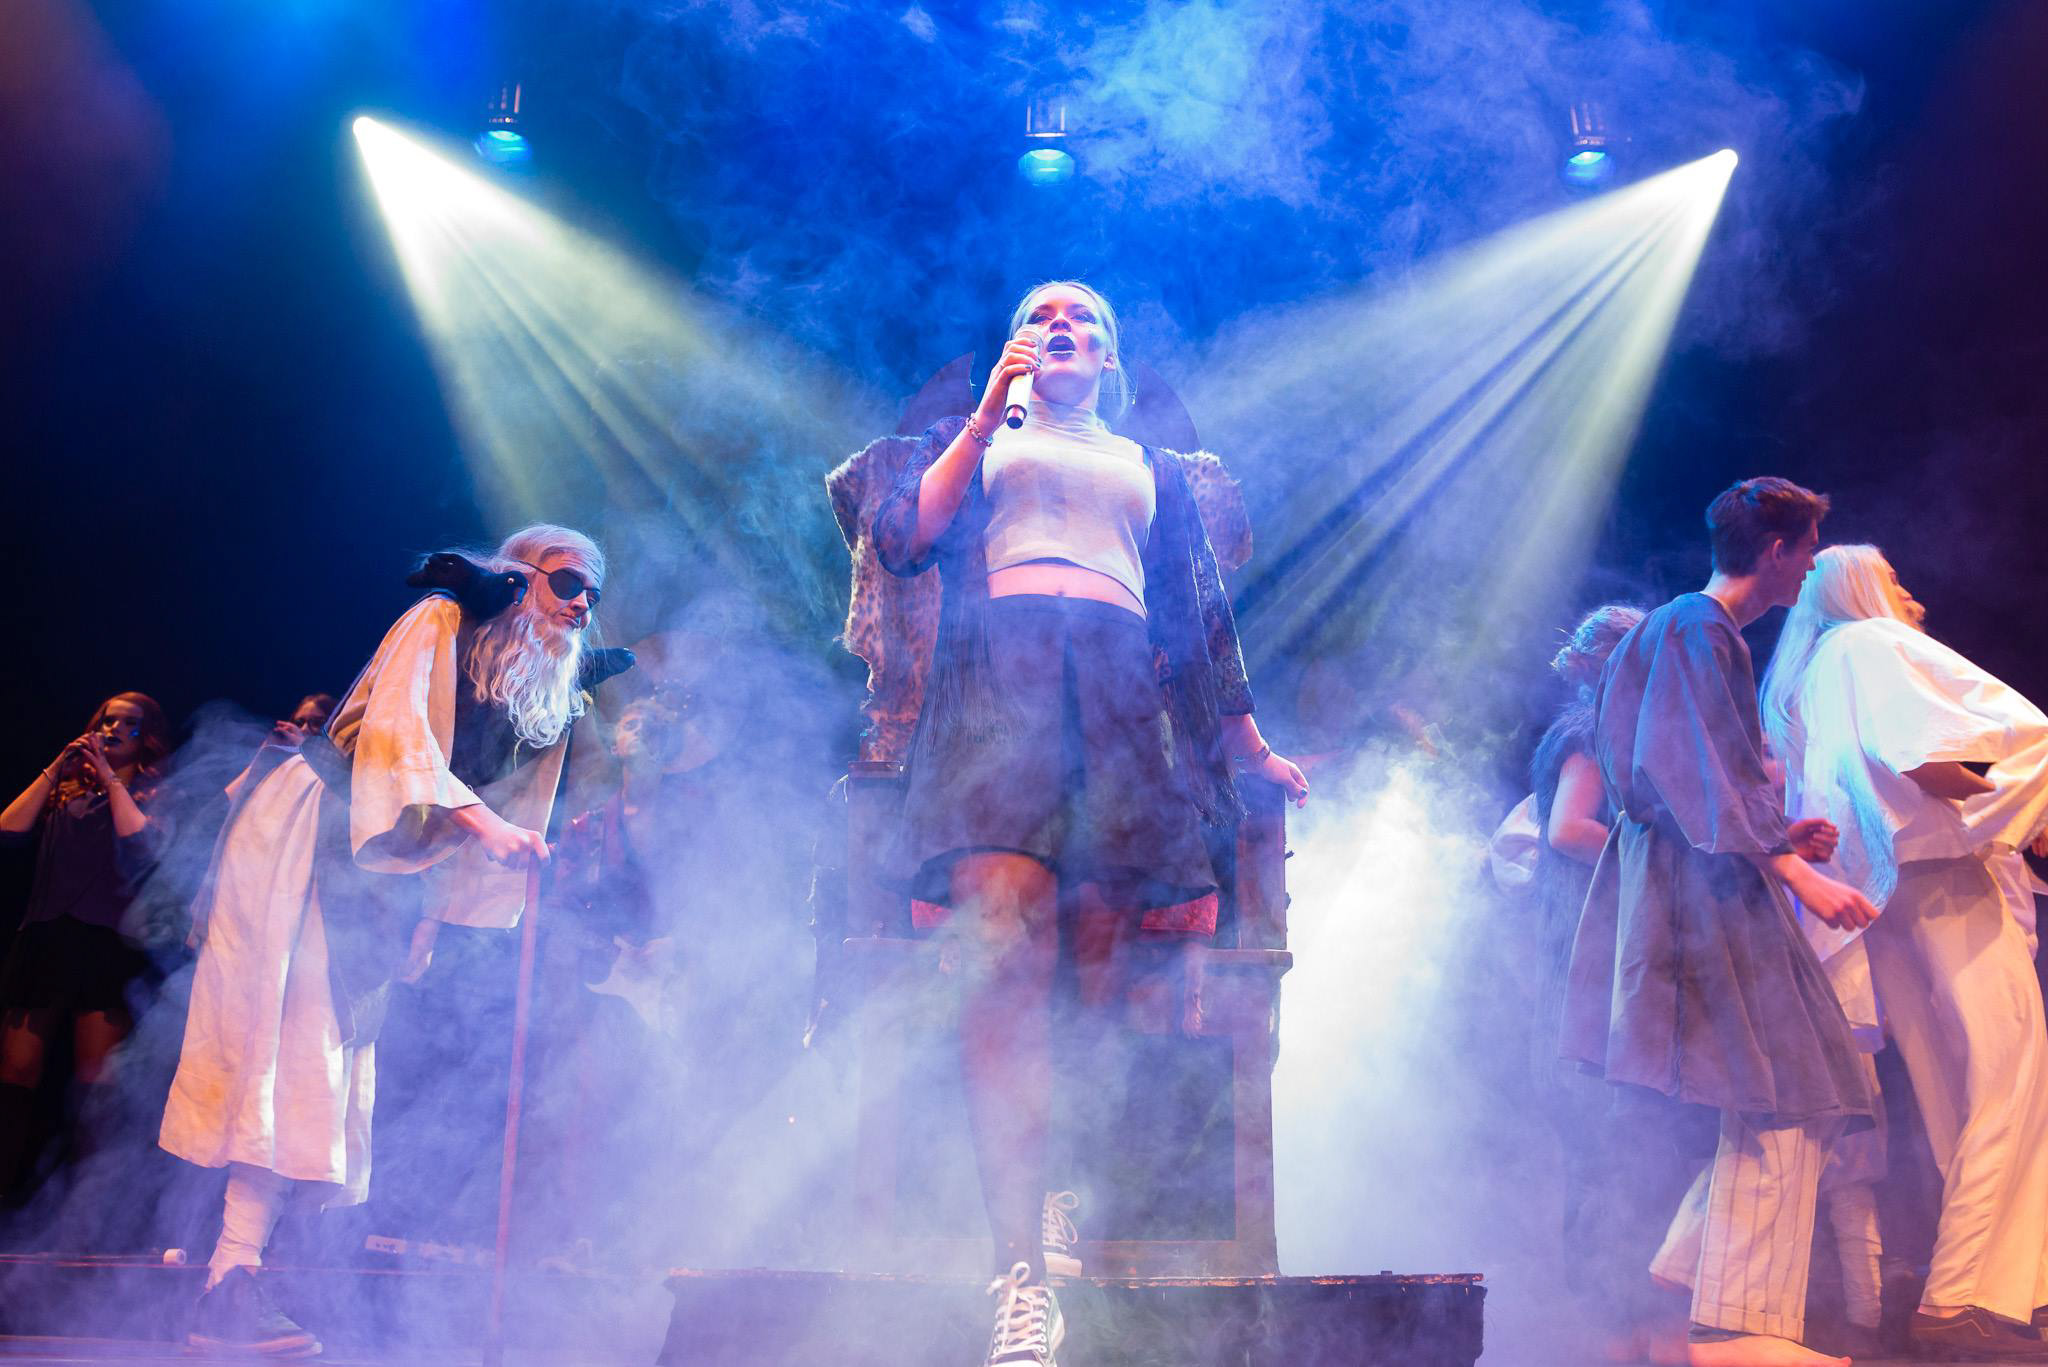 Eventfoto: Teater